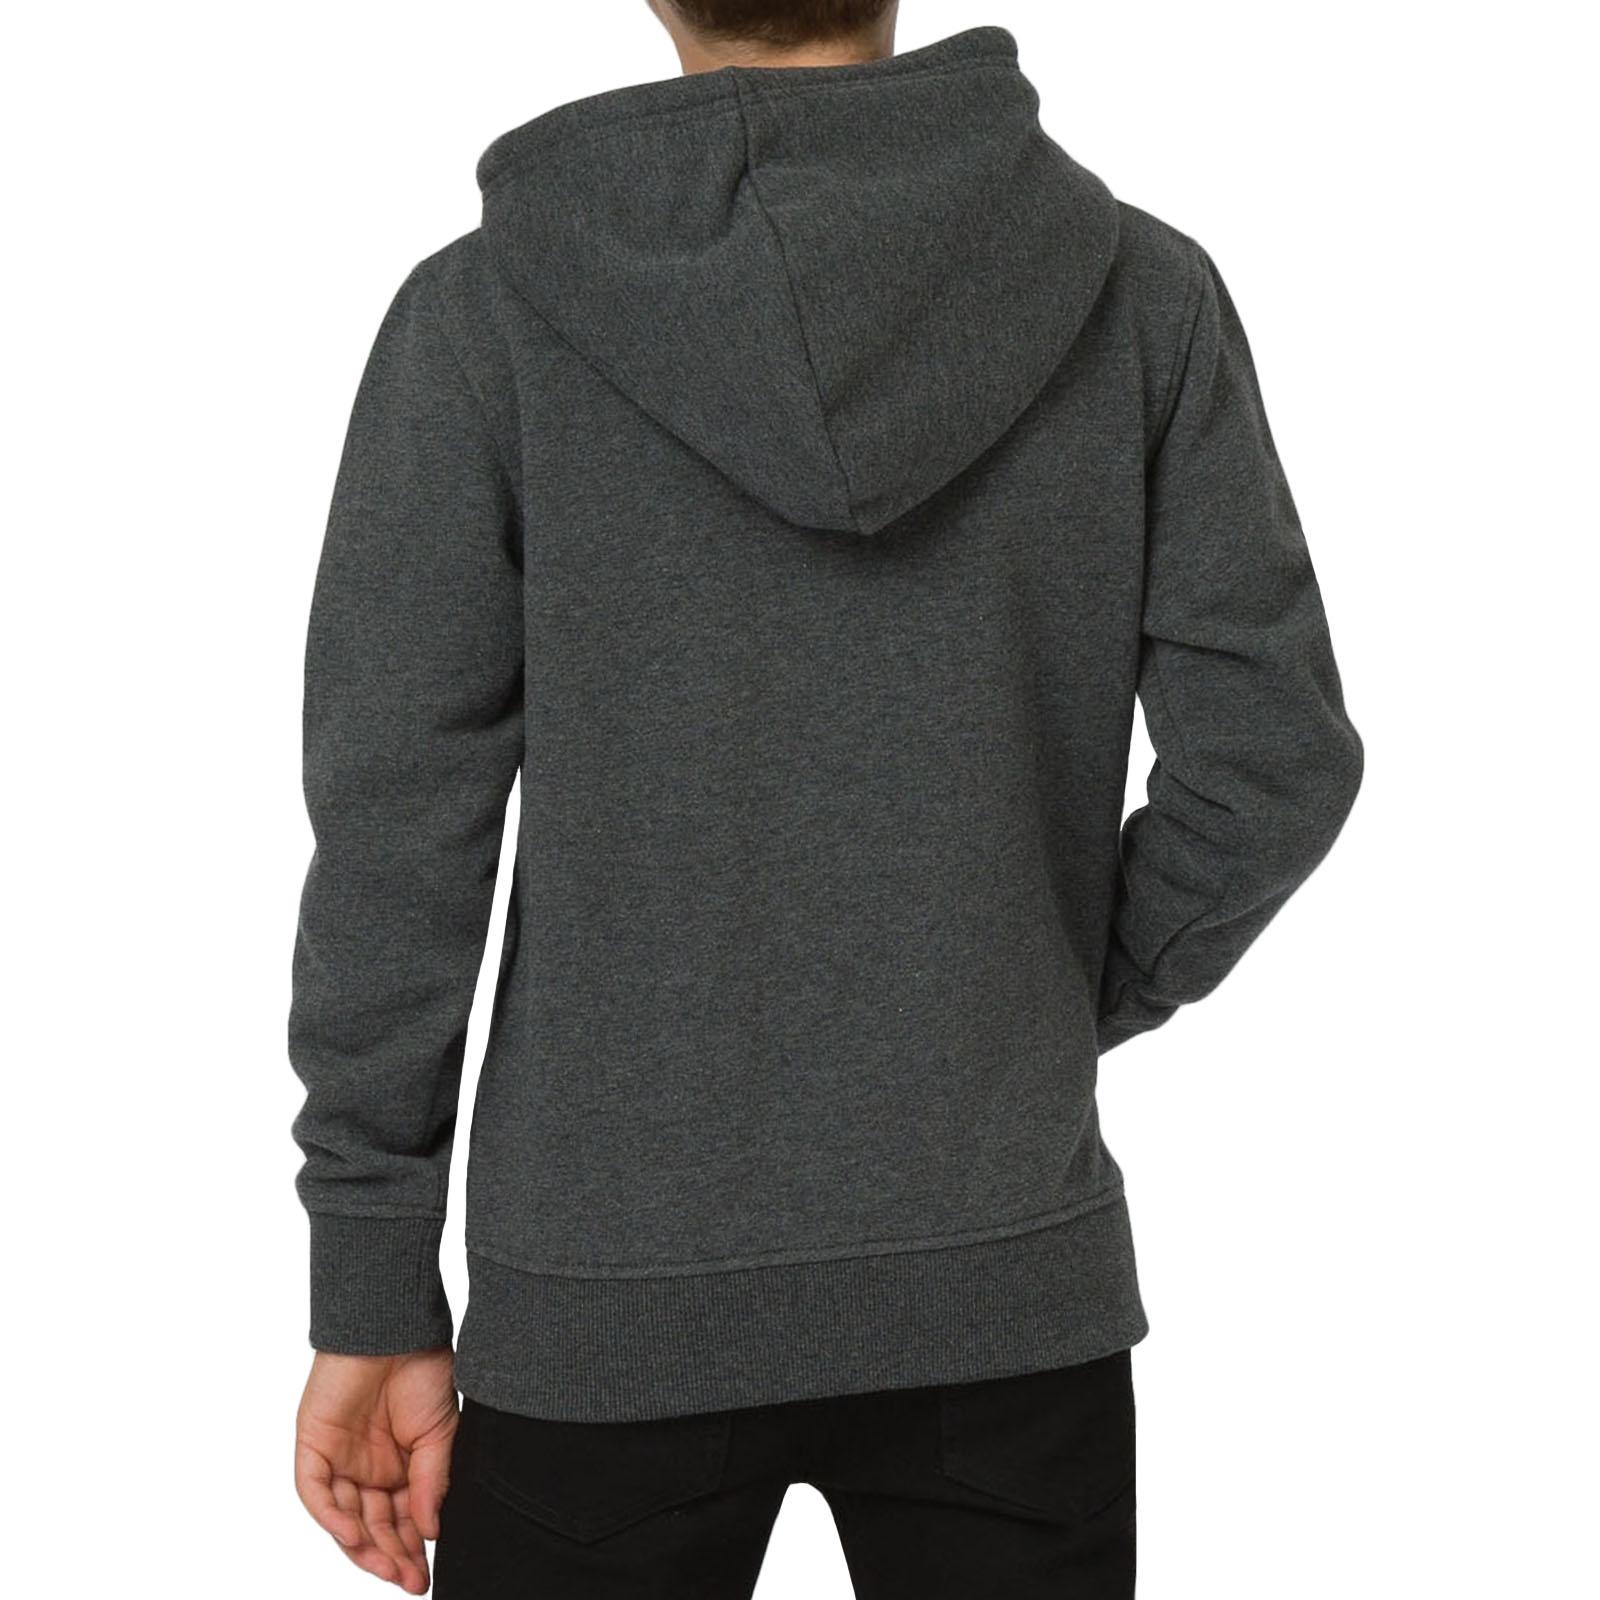 Animal-Boys-Kids-Homer-Casual-Long-Sleeve-Zipped-Hooded-Sweatshirt-Hoodie-Jacket thumbnail 5